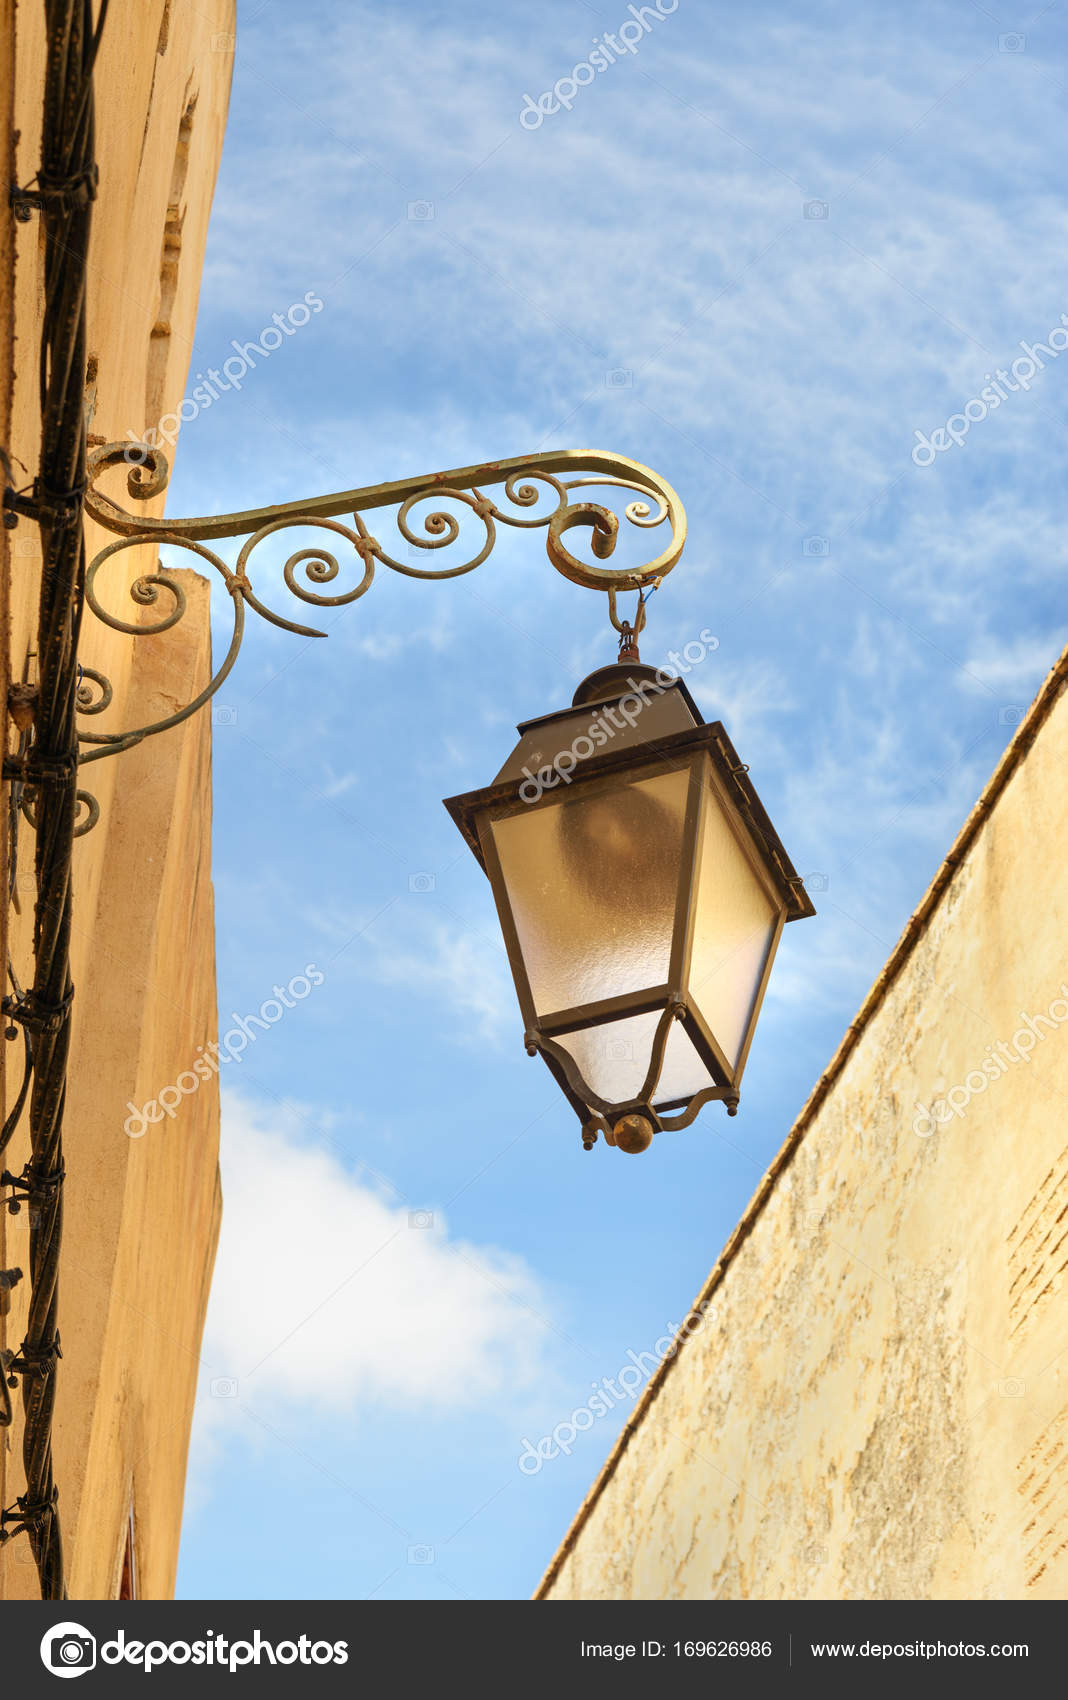 Street light in medina of Fes. Morocco u2014 Stock Photo & Street light in medina of Fes. Morocco u2014 Stock Photo © ElenaOdareeva ...